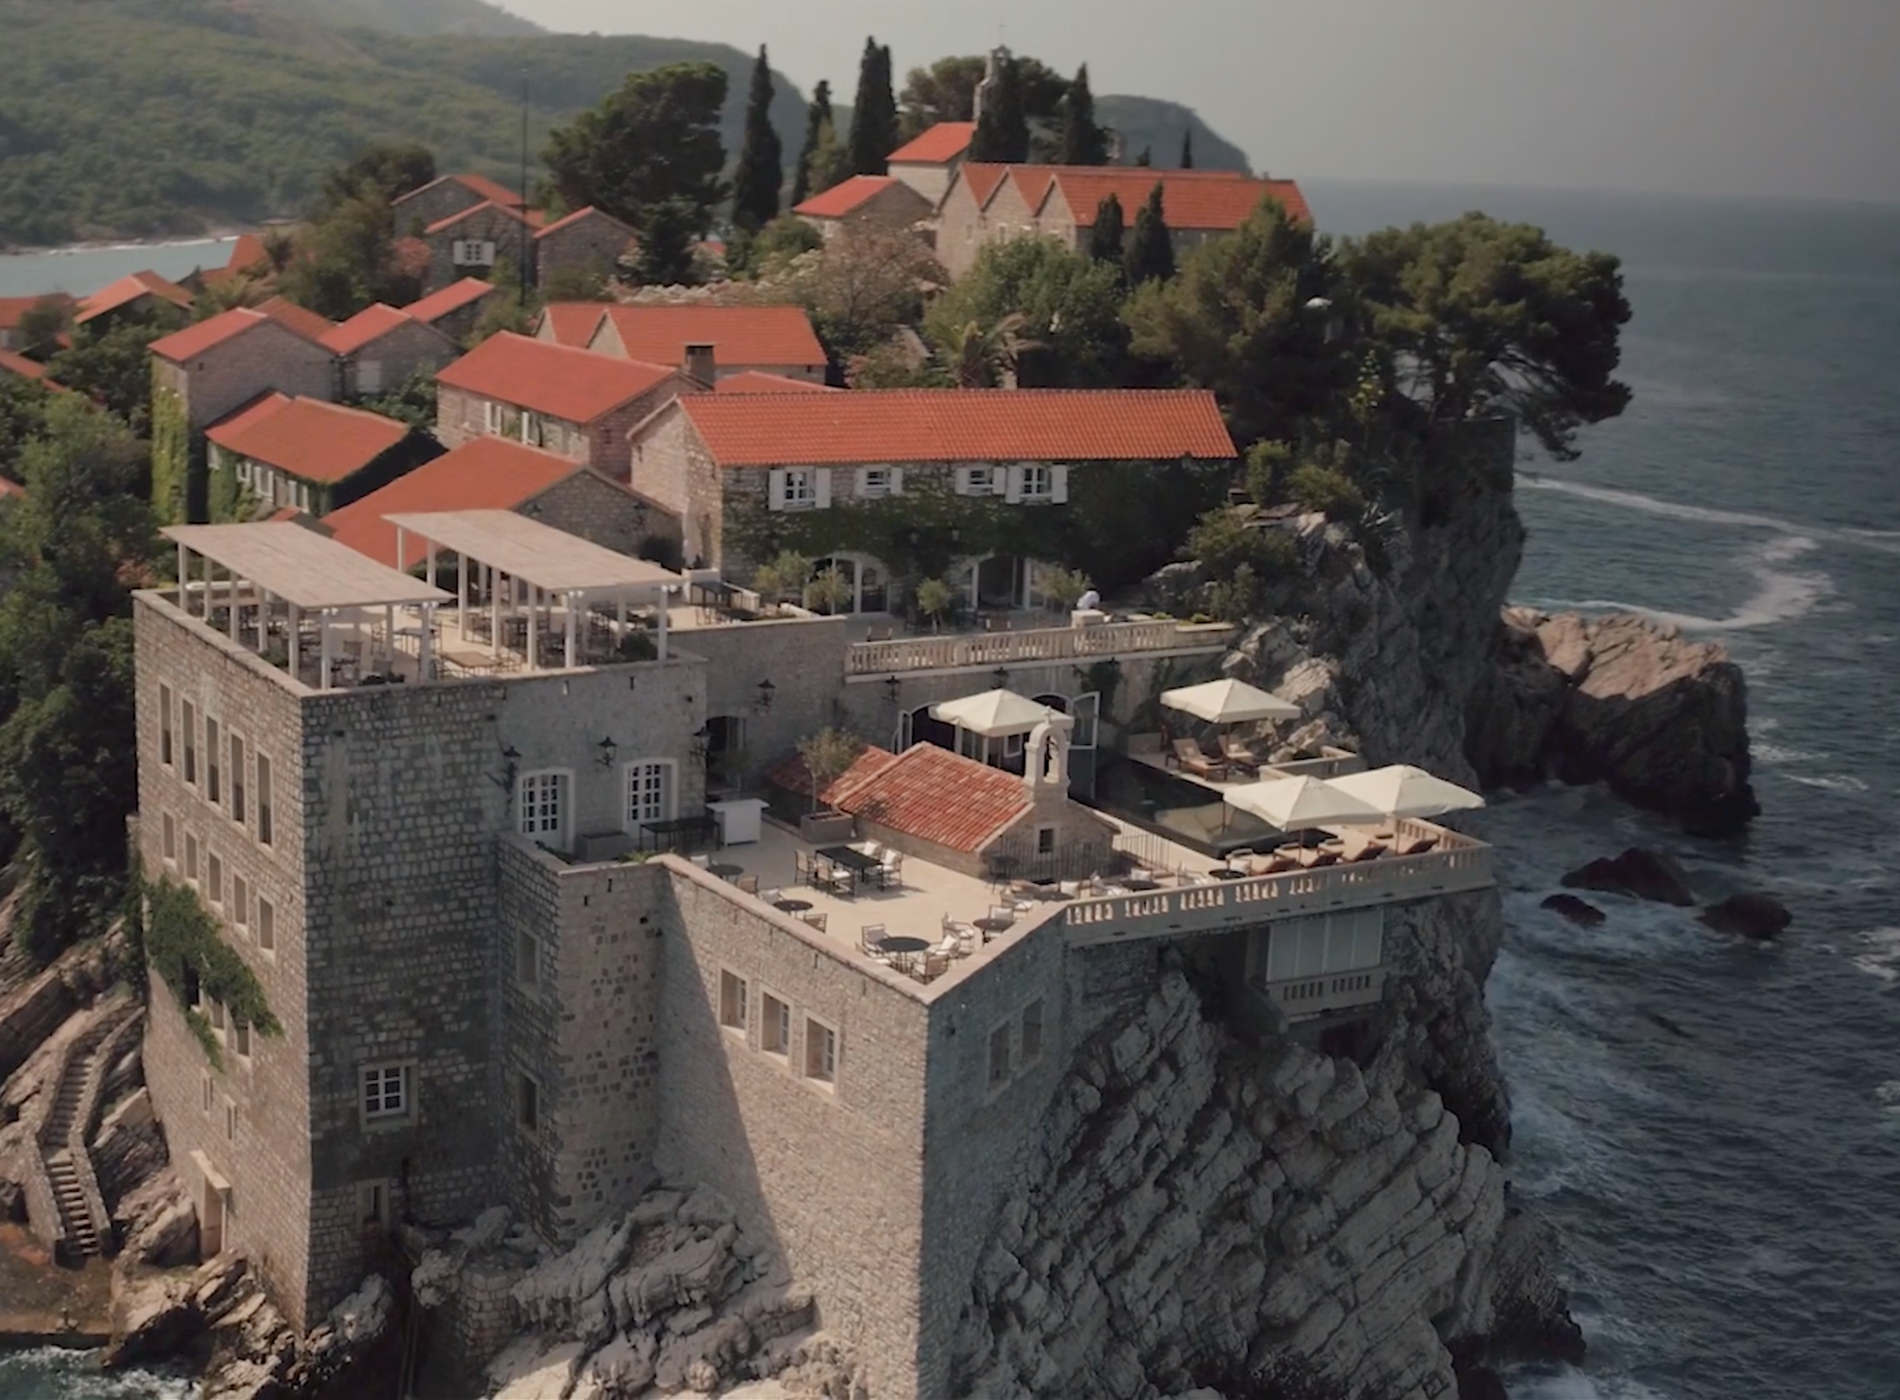 Aman Sveti Stefan Montenegro Hôtel Village île 15eme siècle